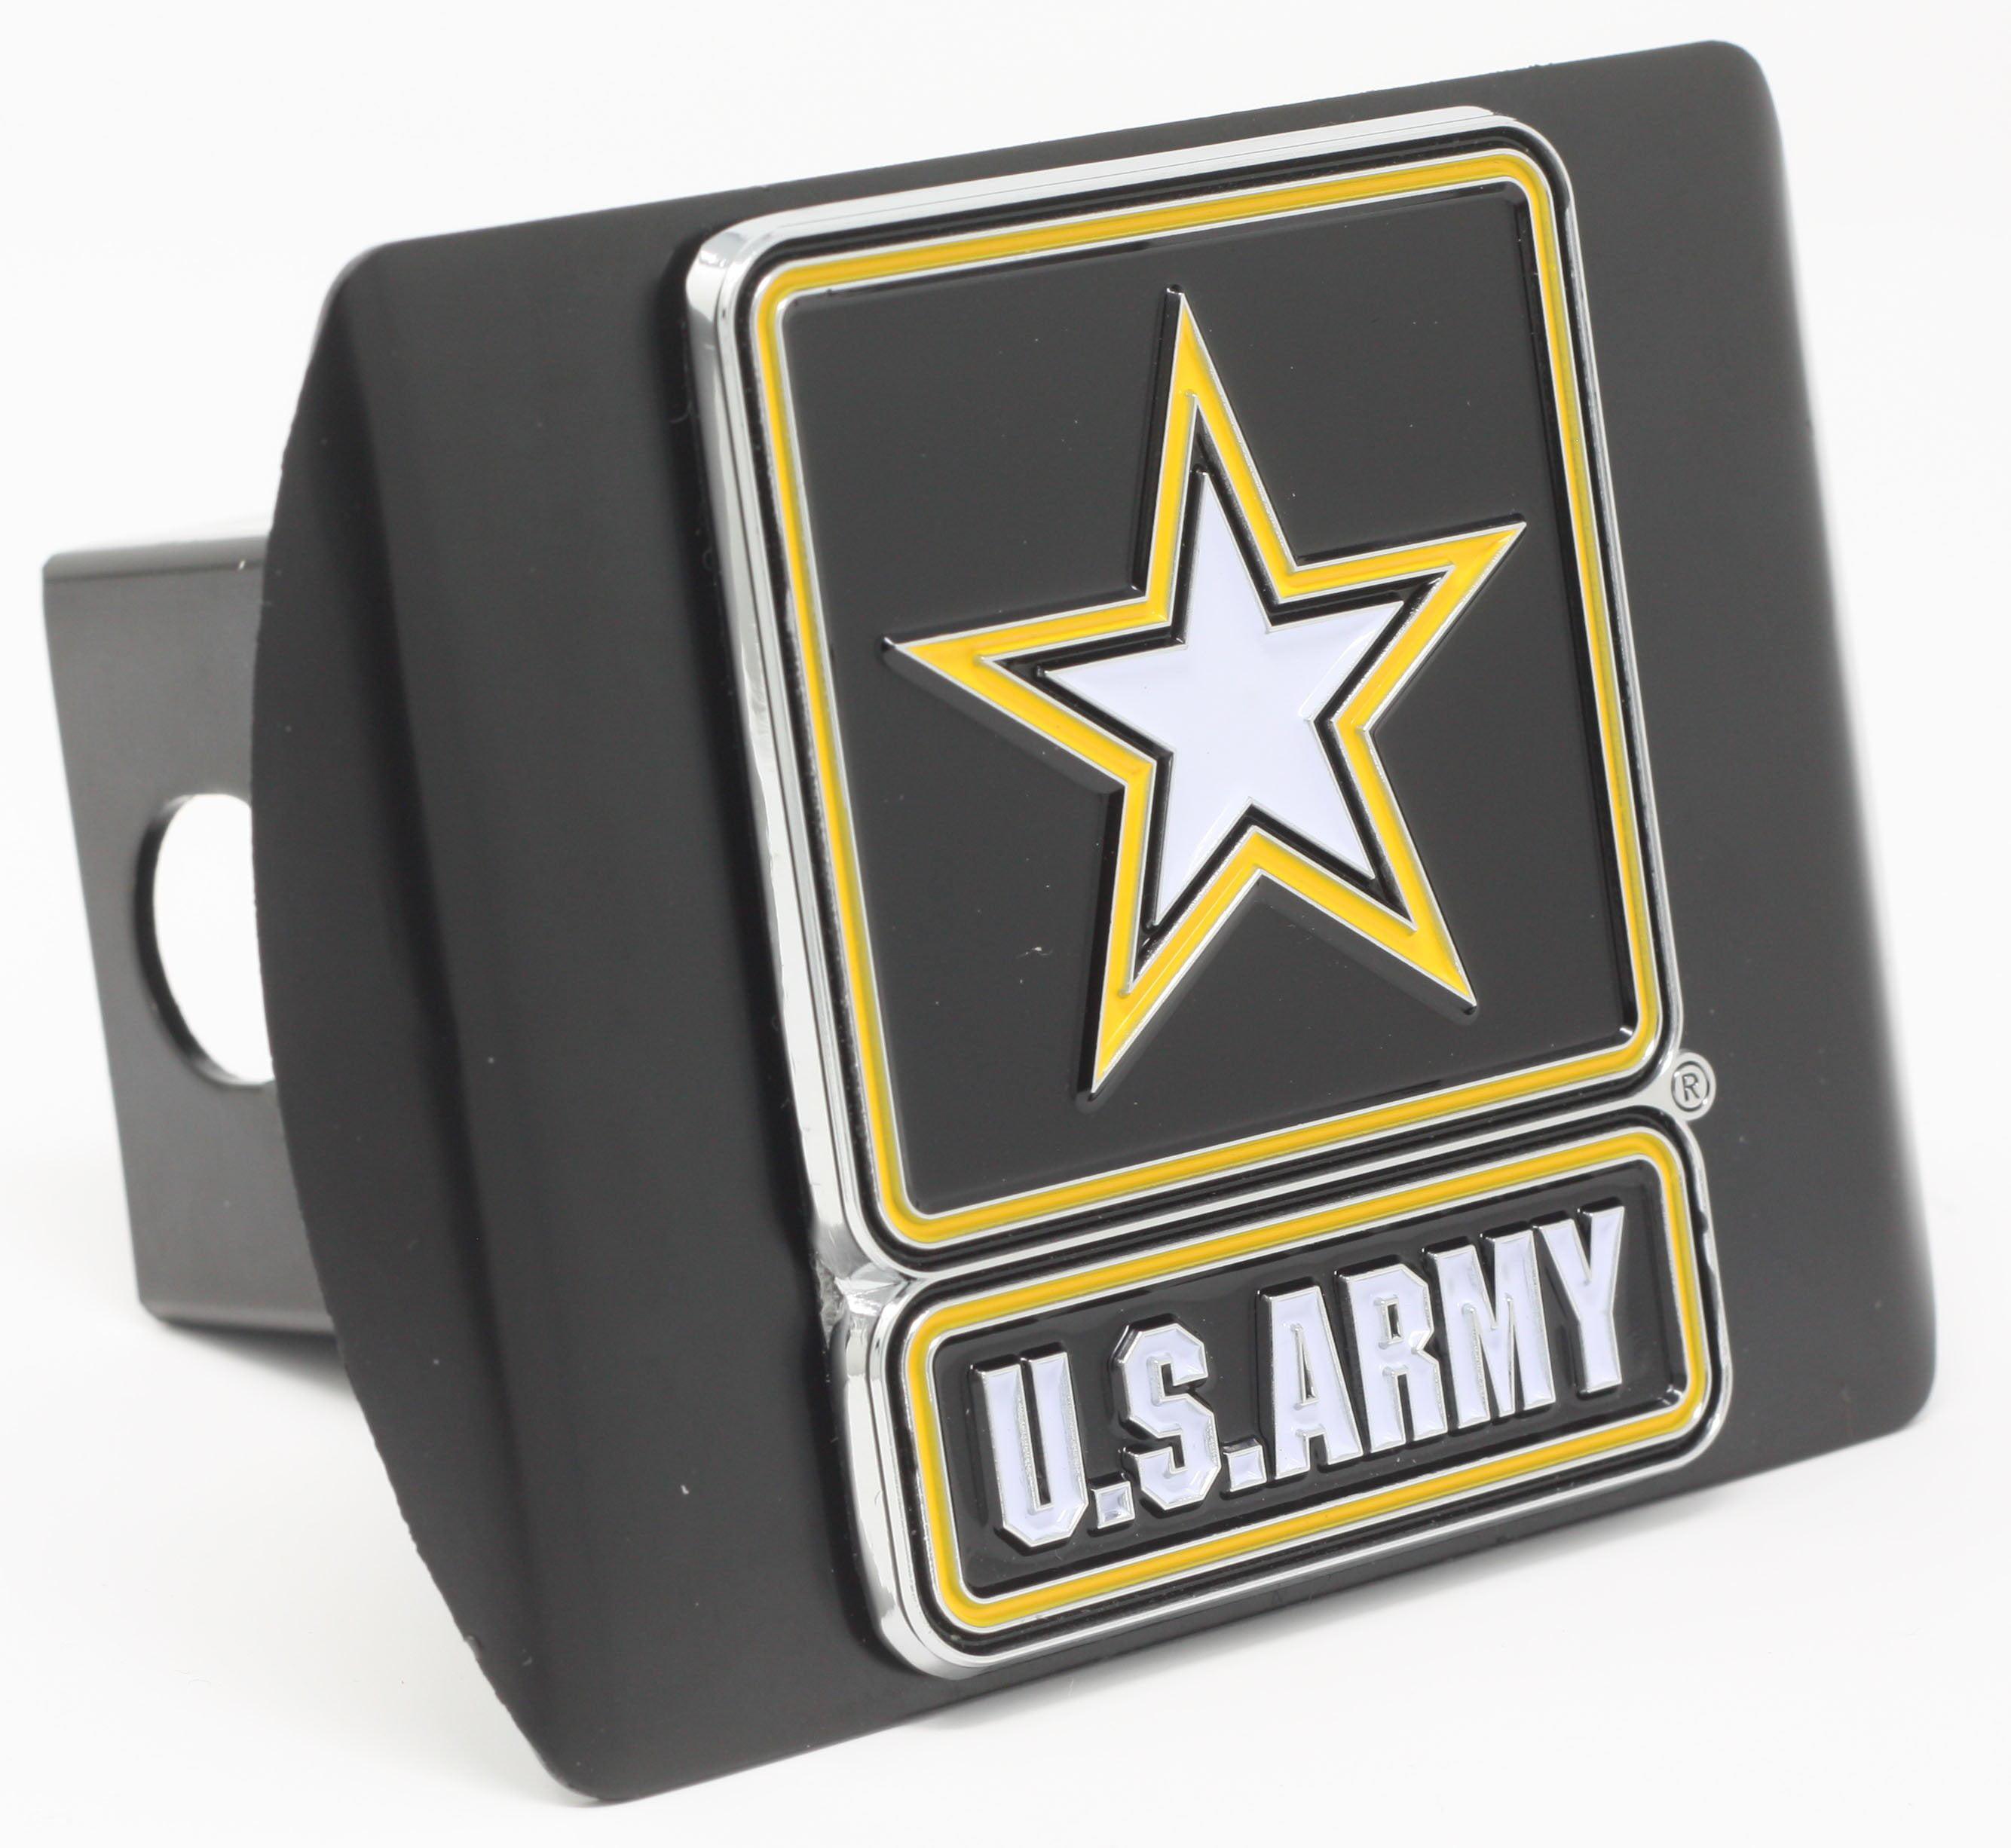 "U.S. Army Color Metal Hitch Black 3.4""x4"""